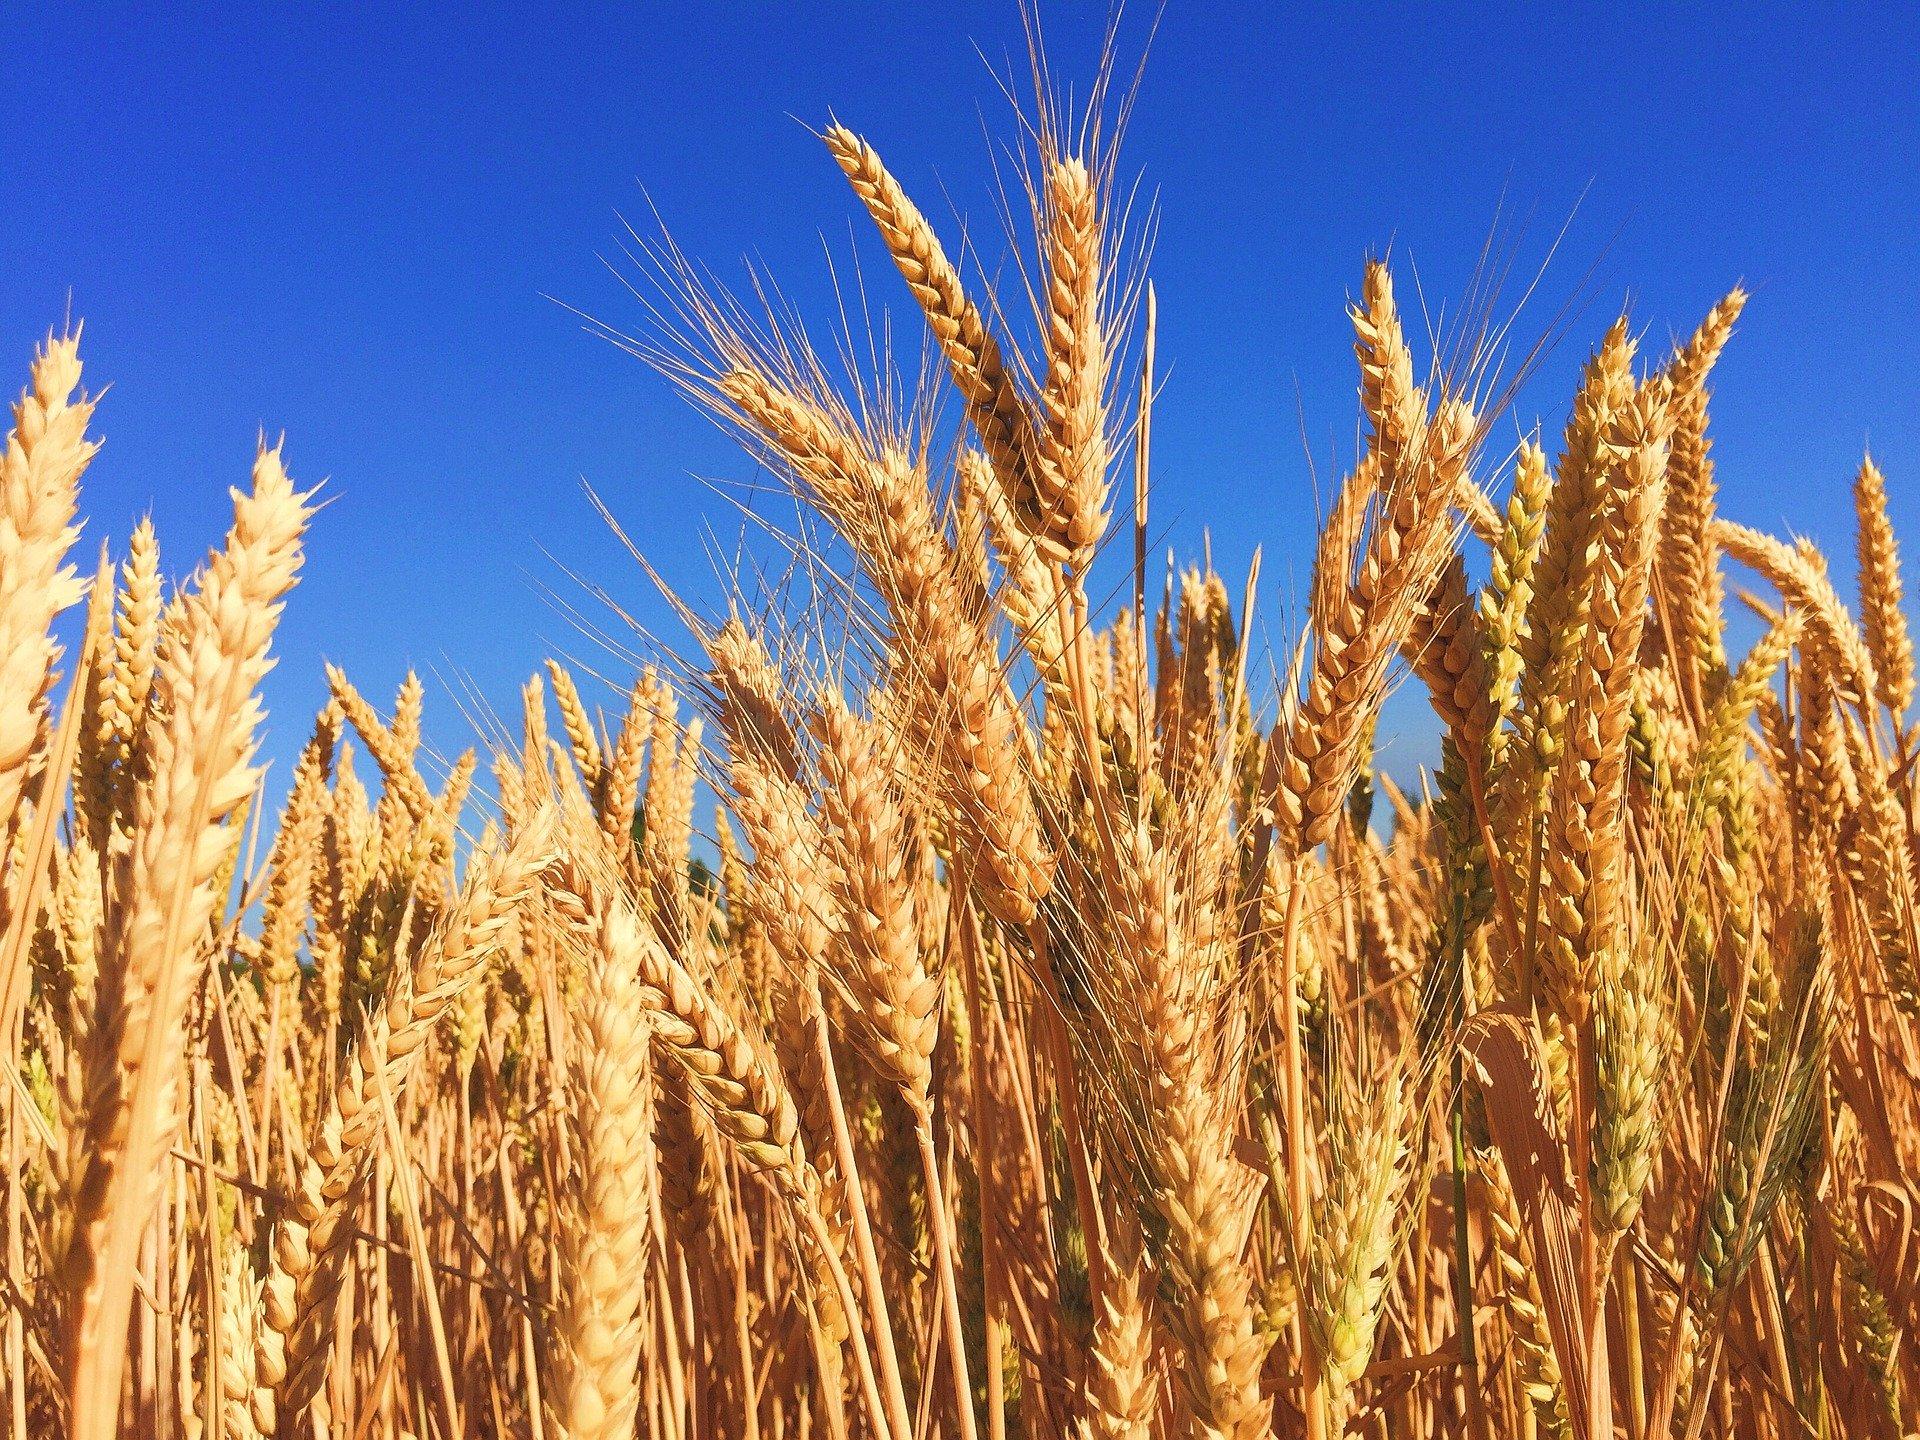 wheat-863392_1920- Image byFree-Photos